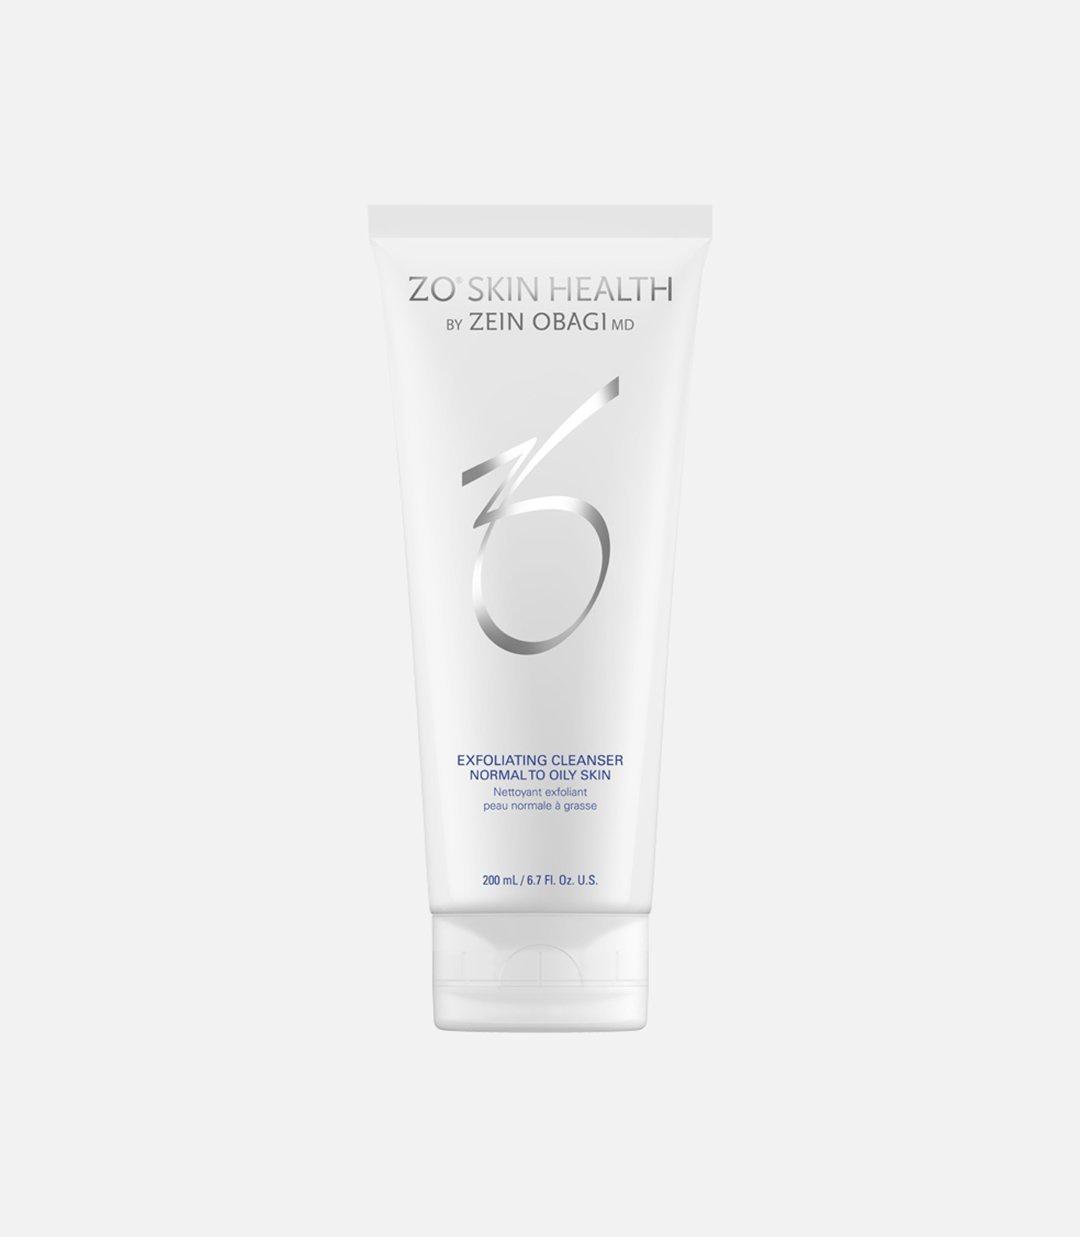 ZO Skin Health Obagi Exfoliating Cleanser